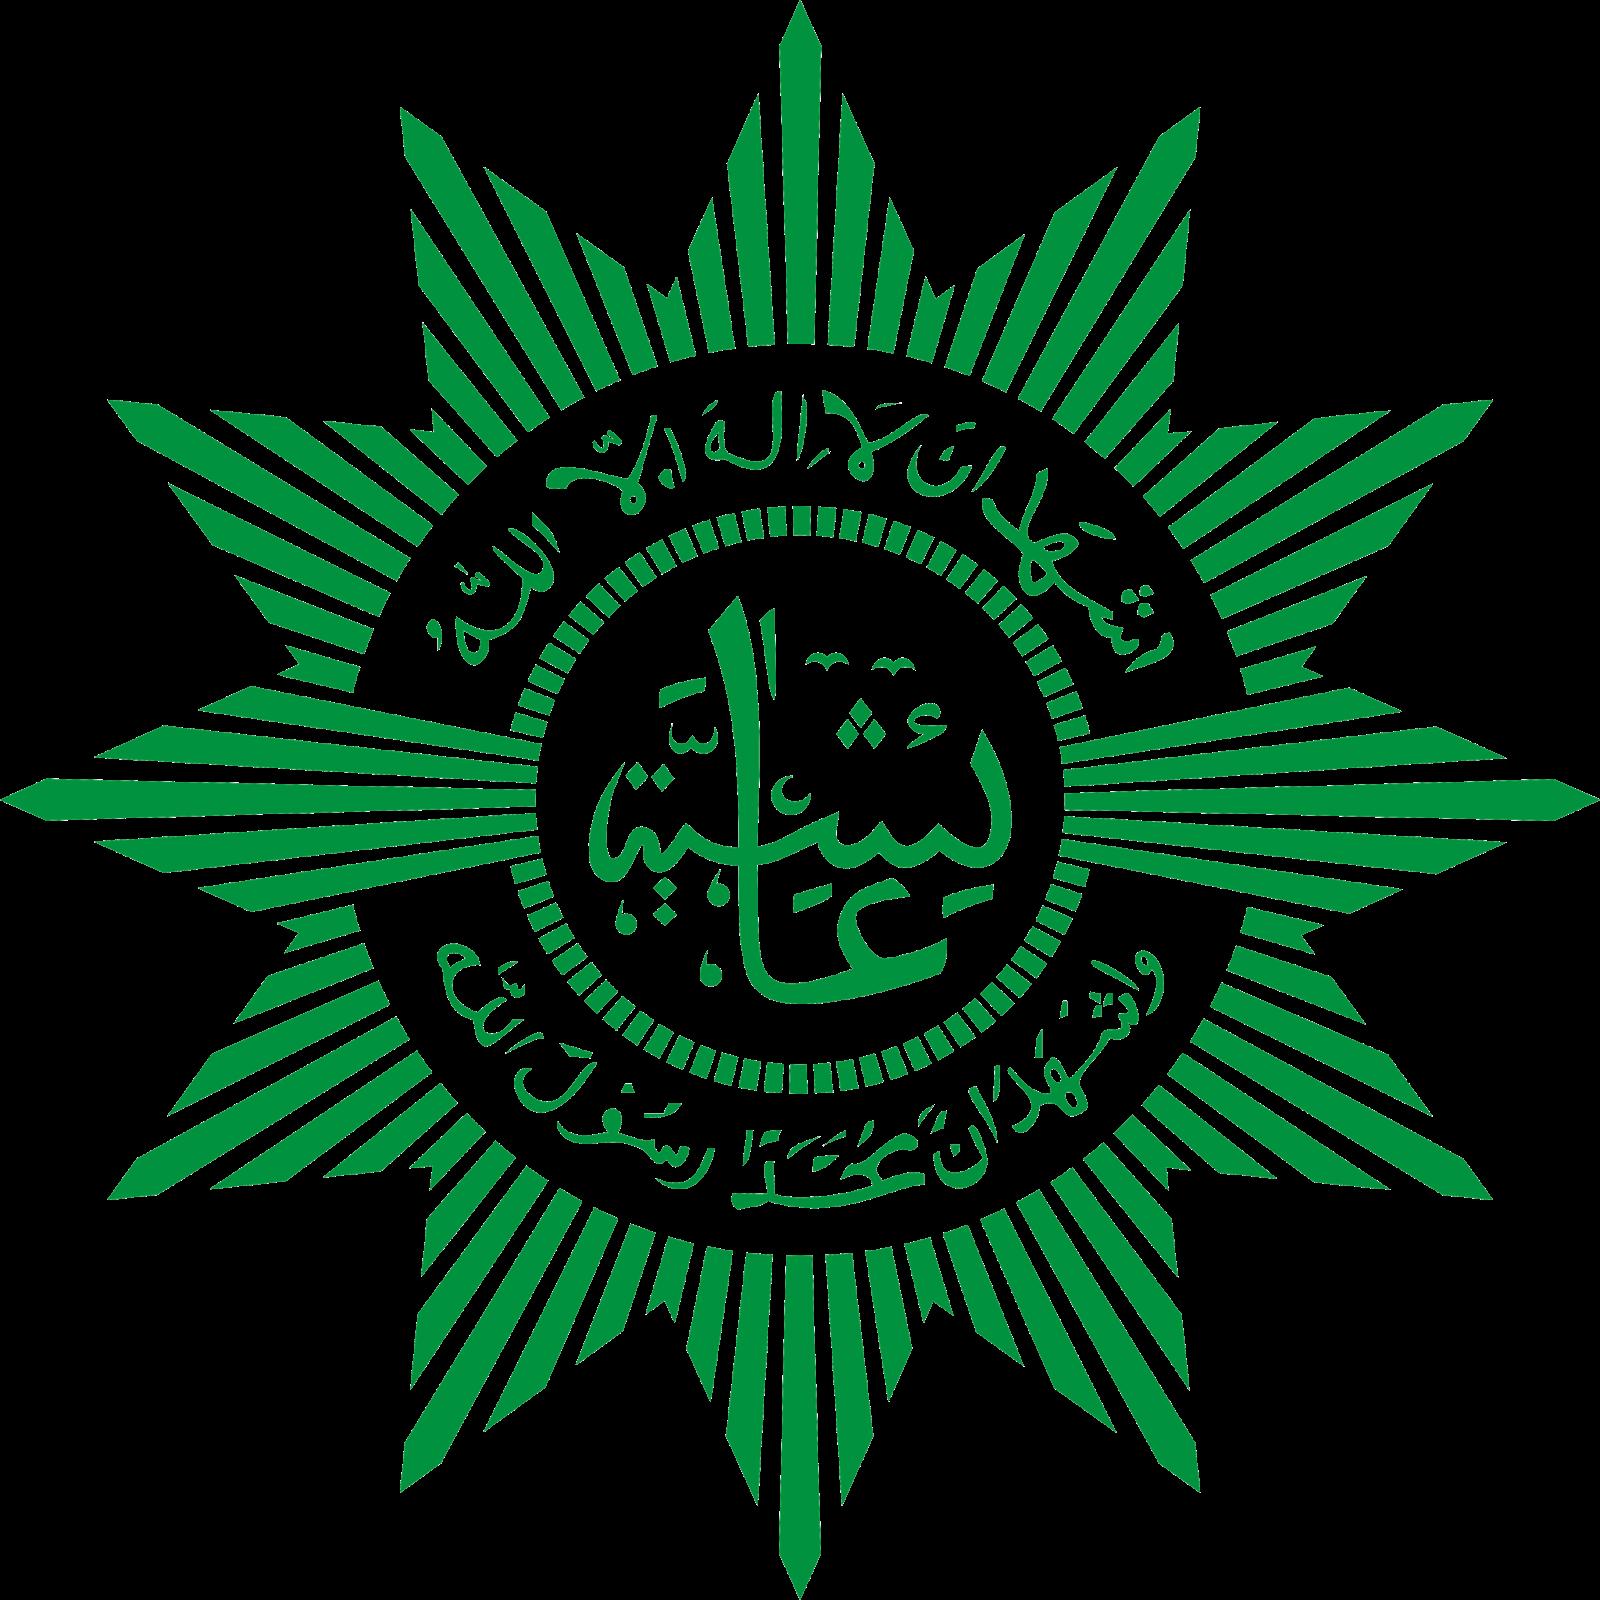 Logo Muhammadiyah dan Ortom-nya. - PCM Panggungrejo - Kota ...